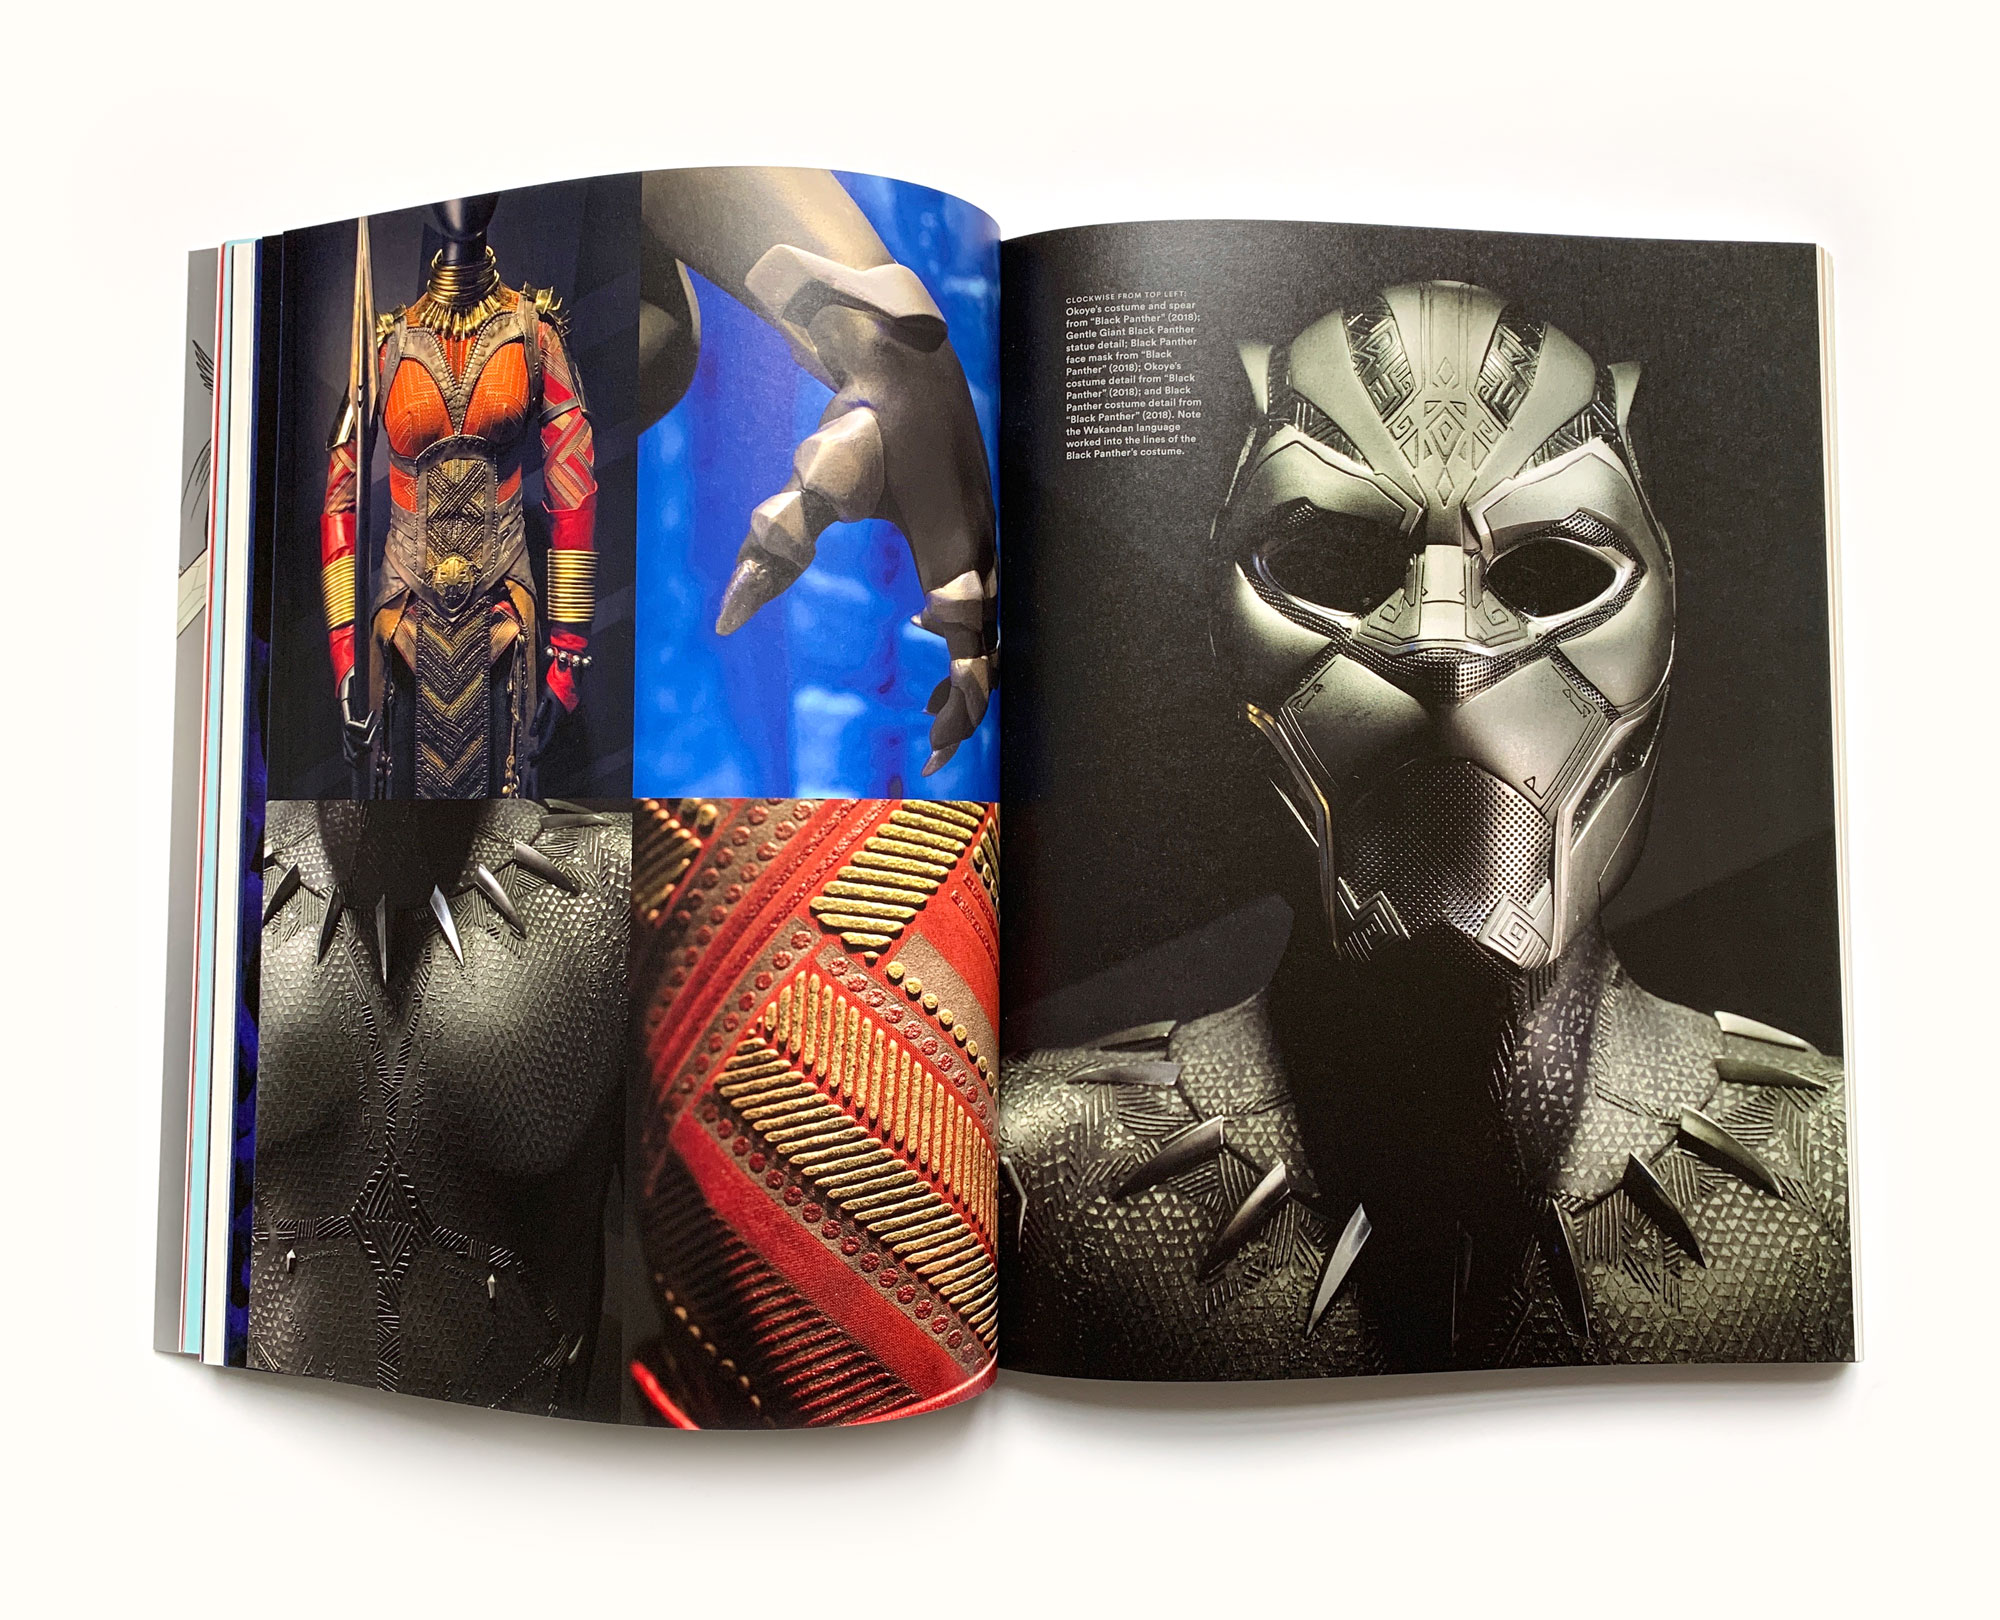 Marvel-Universe-of-Super-Heroes-Book-Balgavy-Avengers-BlackPanther4.jpg